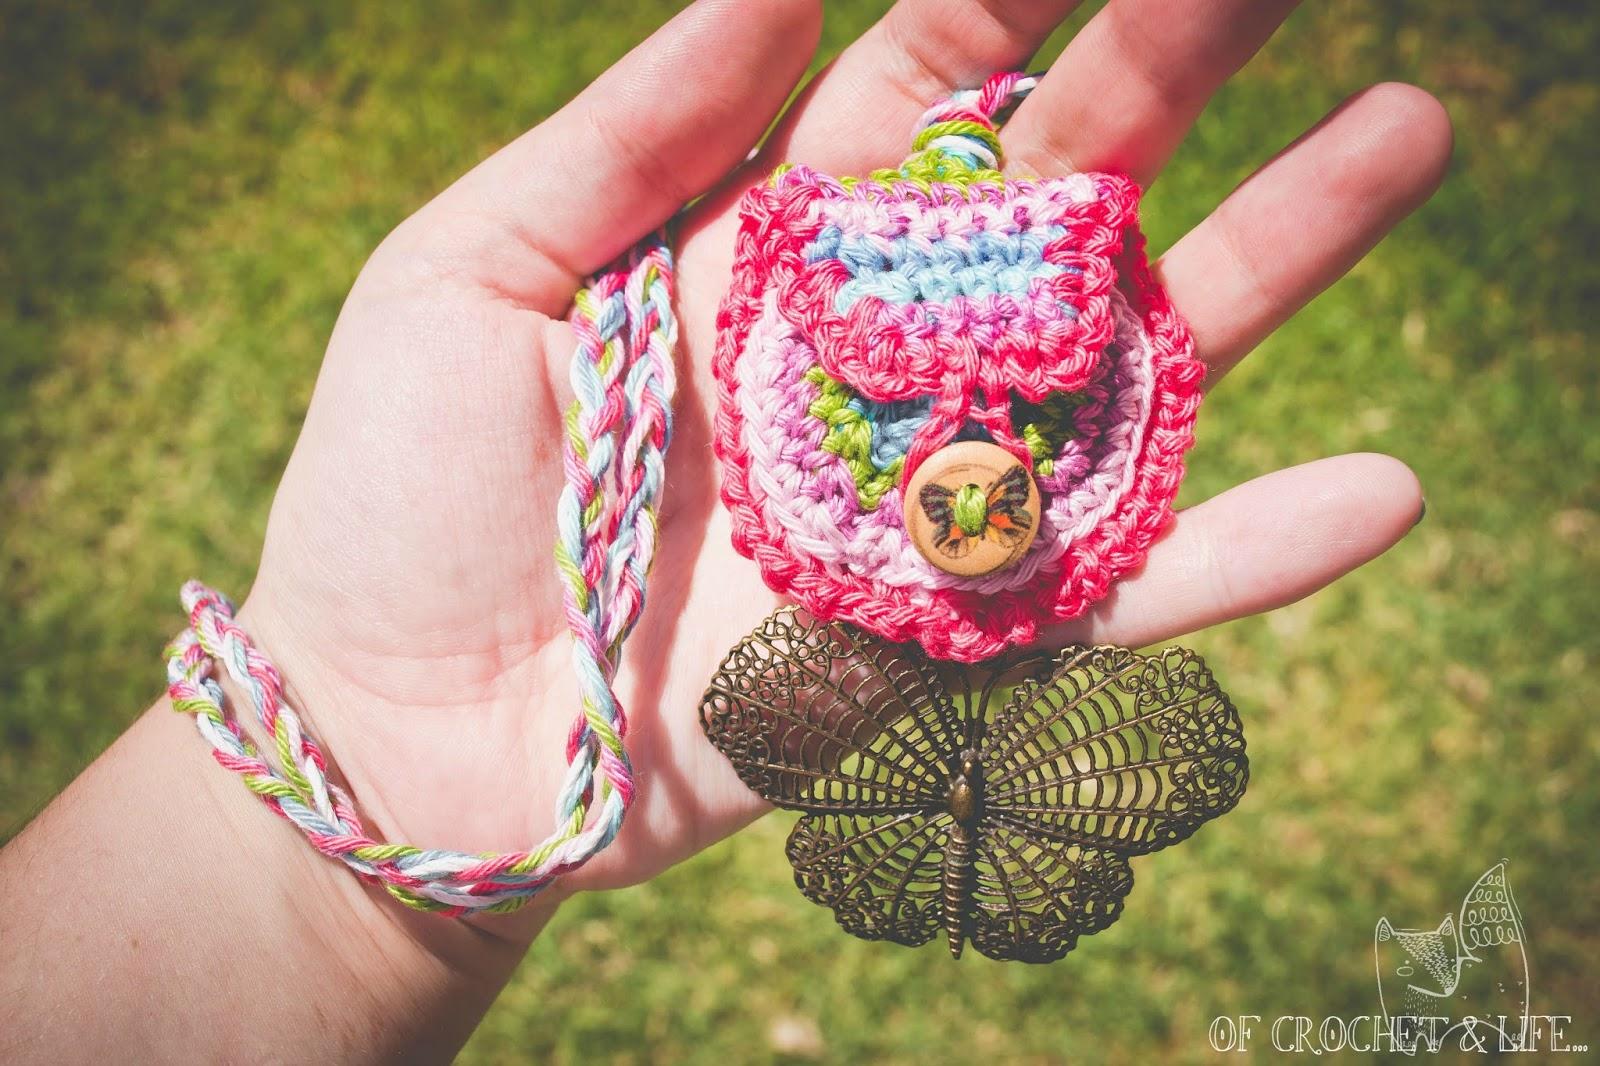 Of Crochet and Life...: Crystal Mandala Medicine Bag